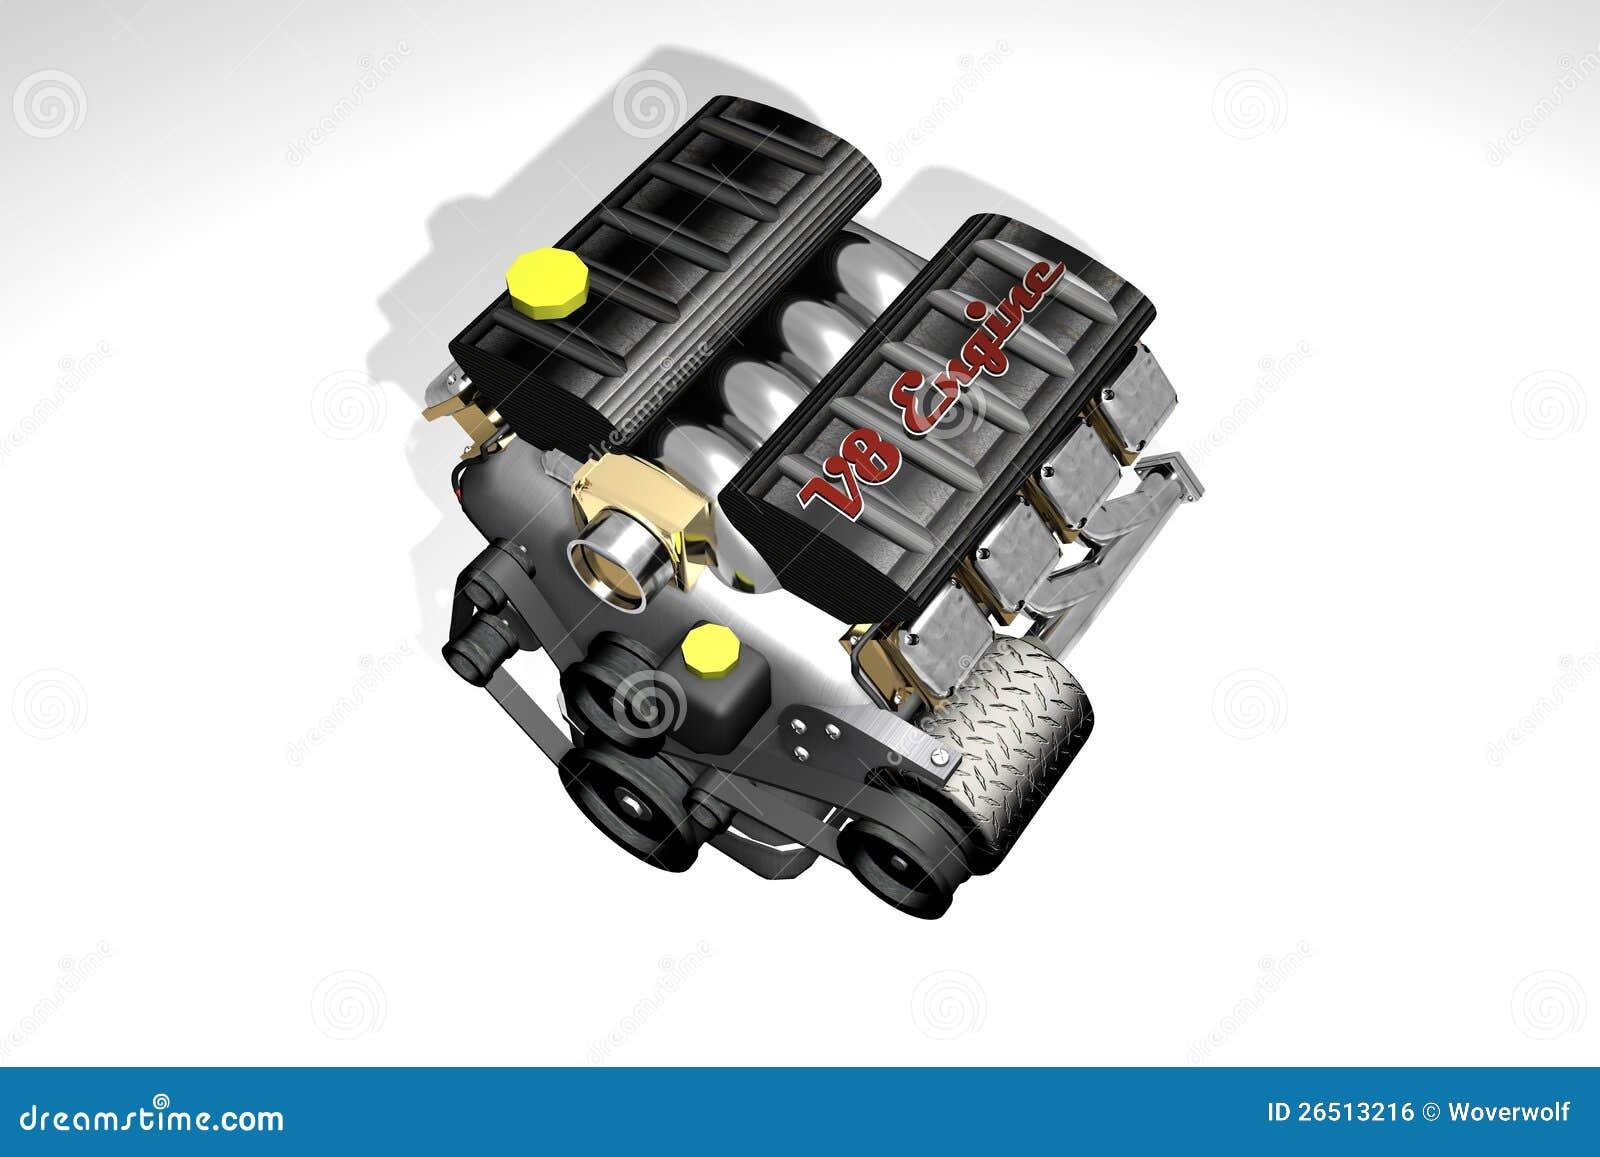 V8 Engine Clipart Engine car V8 Royalty Free